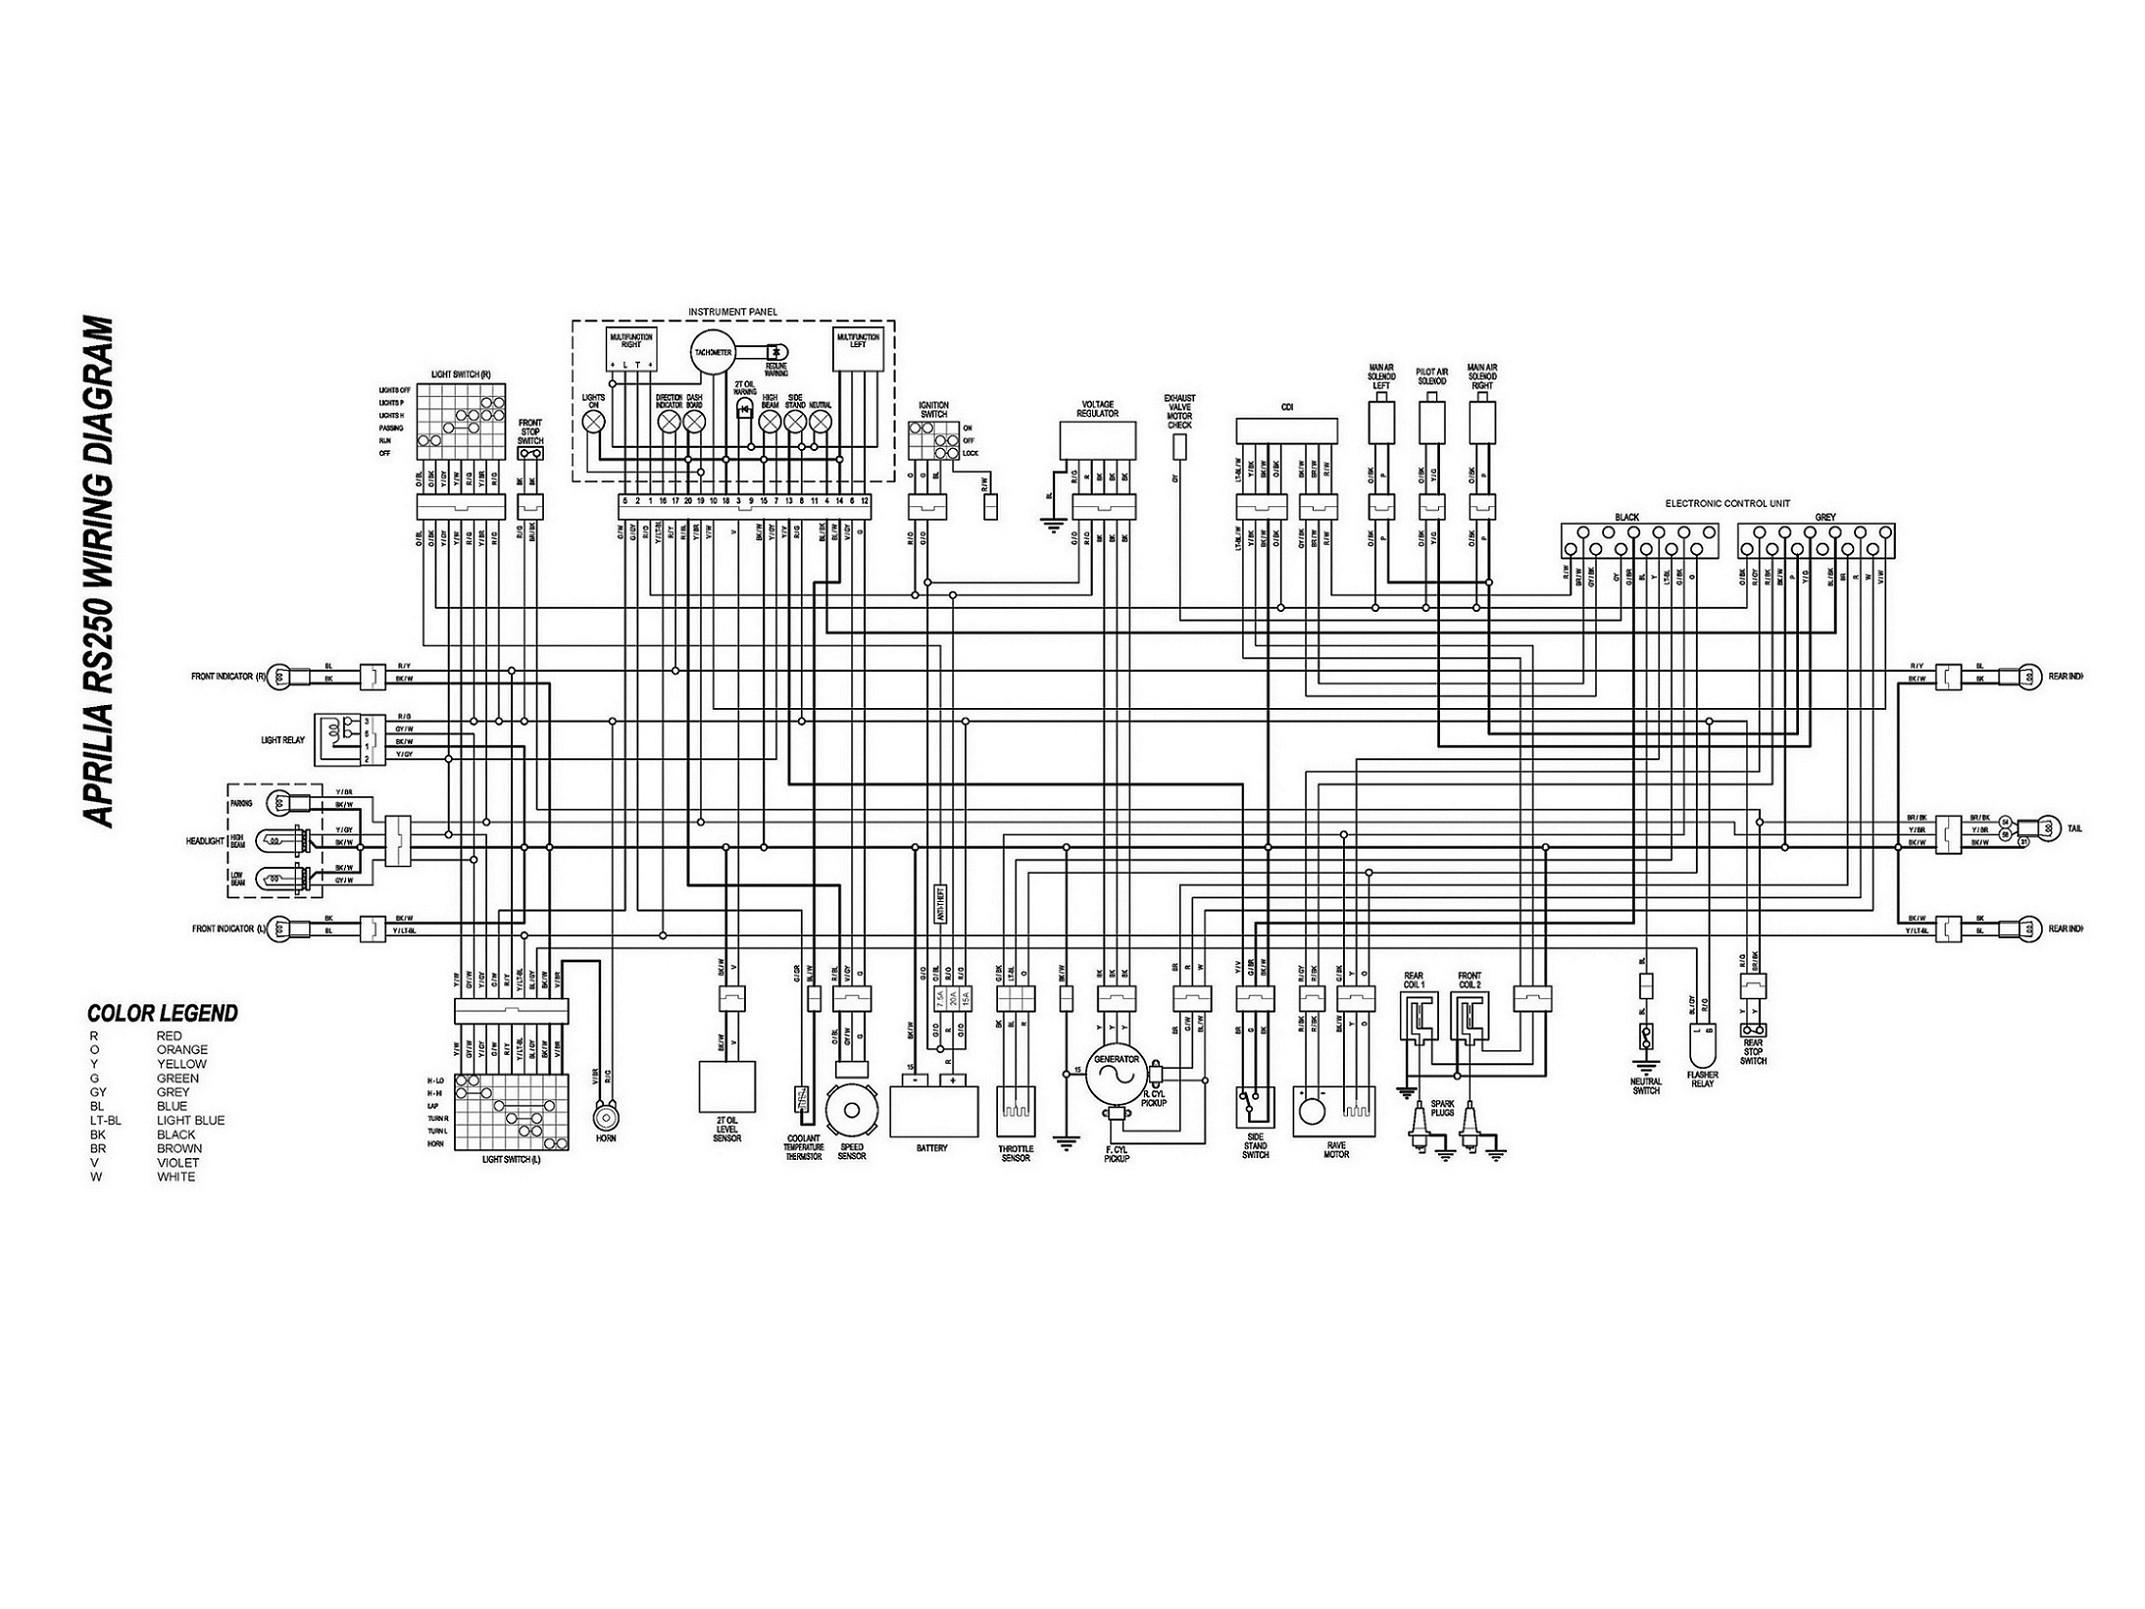 [SCHEMATICS_4CA]  DCE9BD Wiring Diagram For Aprilia Rs 125 | Wiring Resources | Aprilia Leonardo 125 Wiring Diagram |  | Wiring Resources